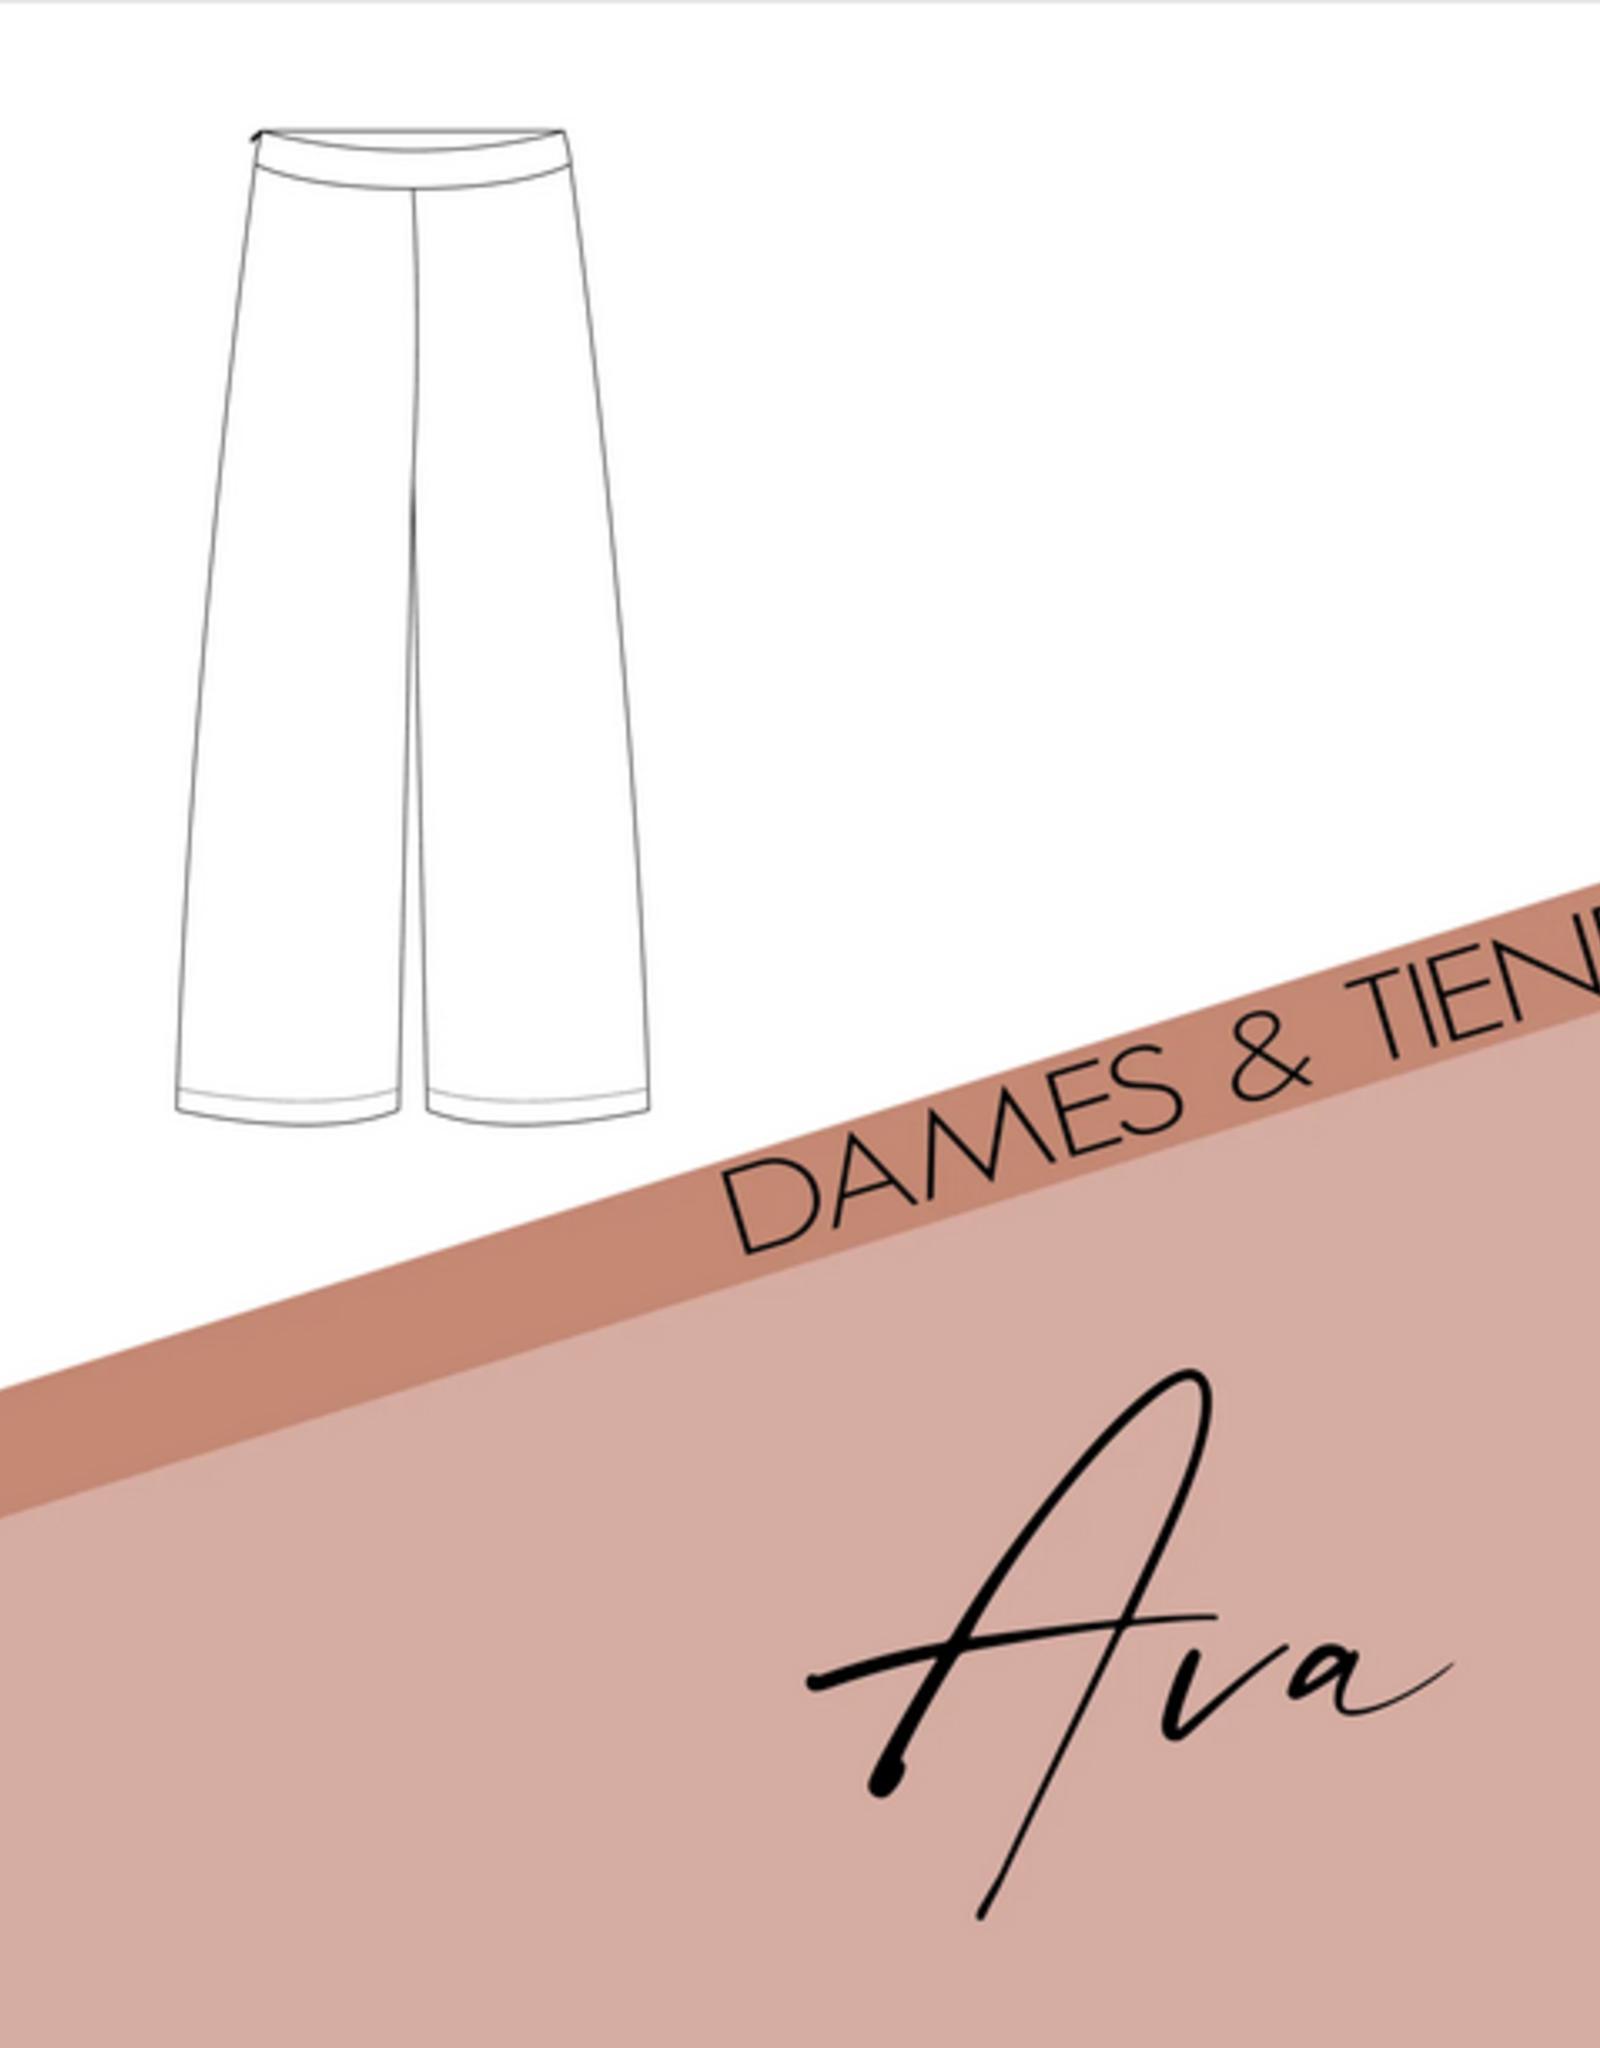 Bel'Etoile Ava - Dames en Tieners 32-50